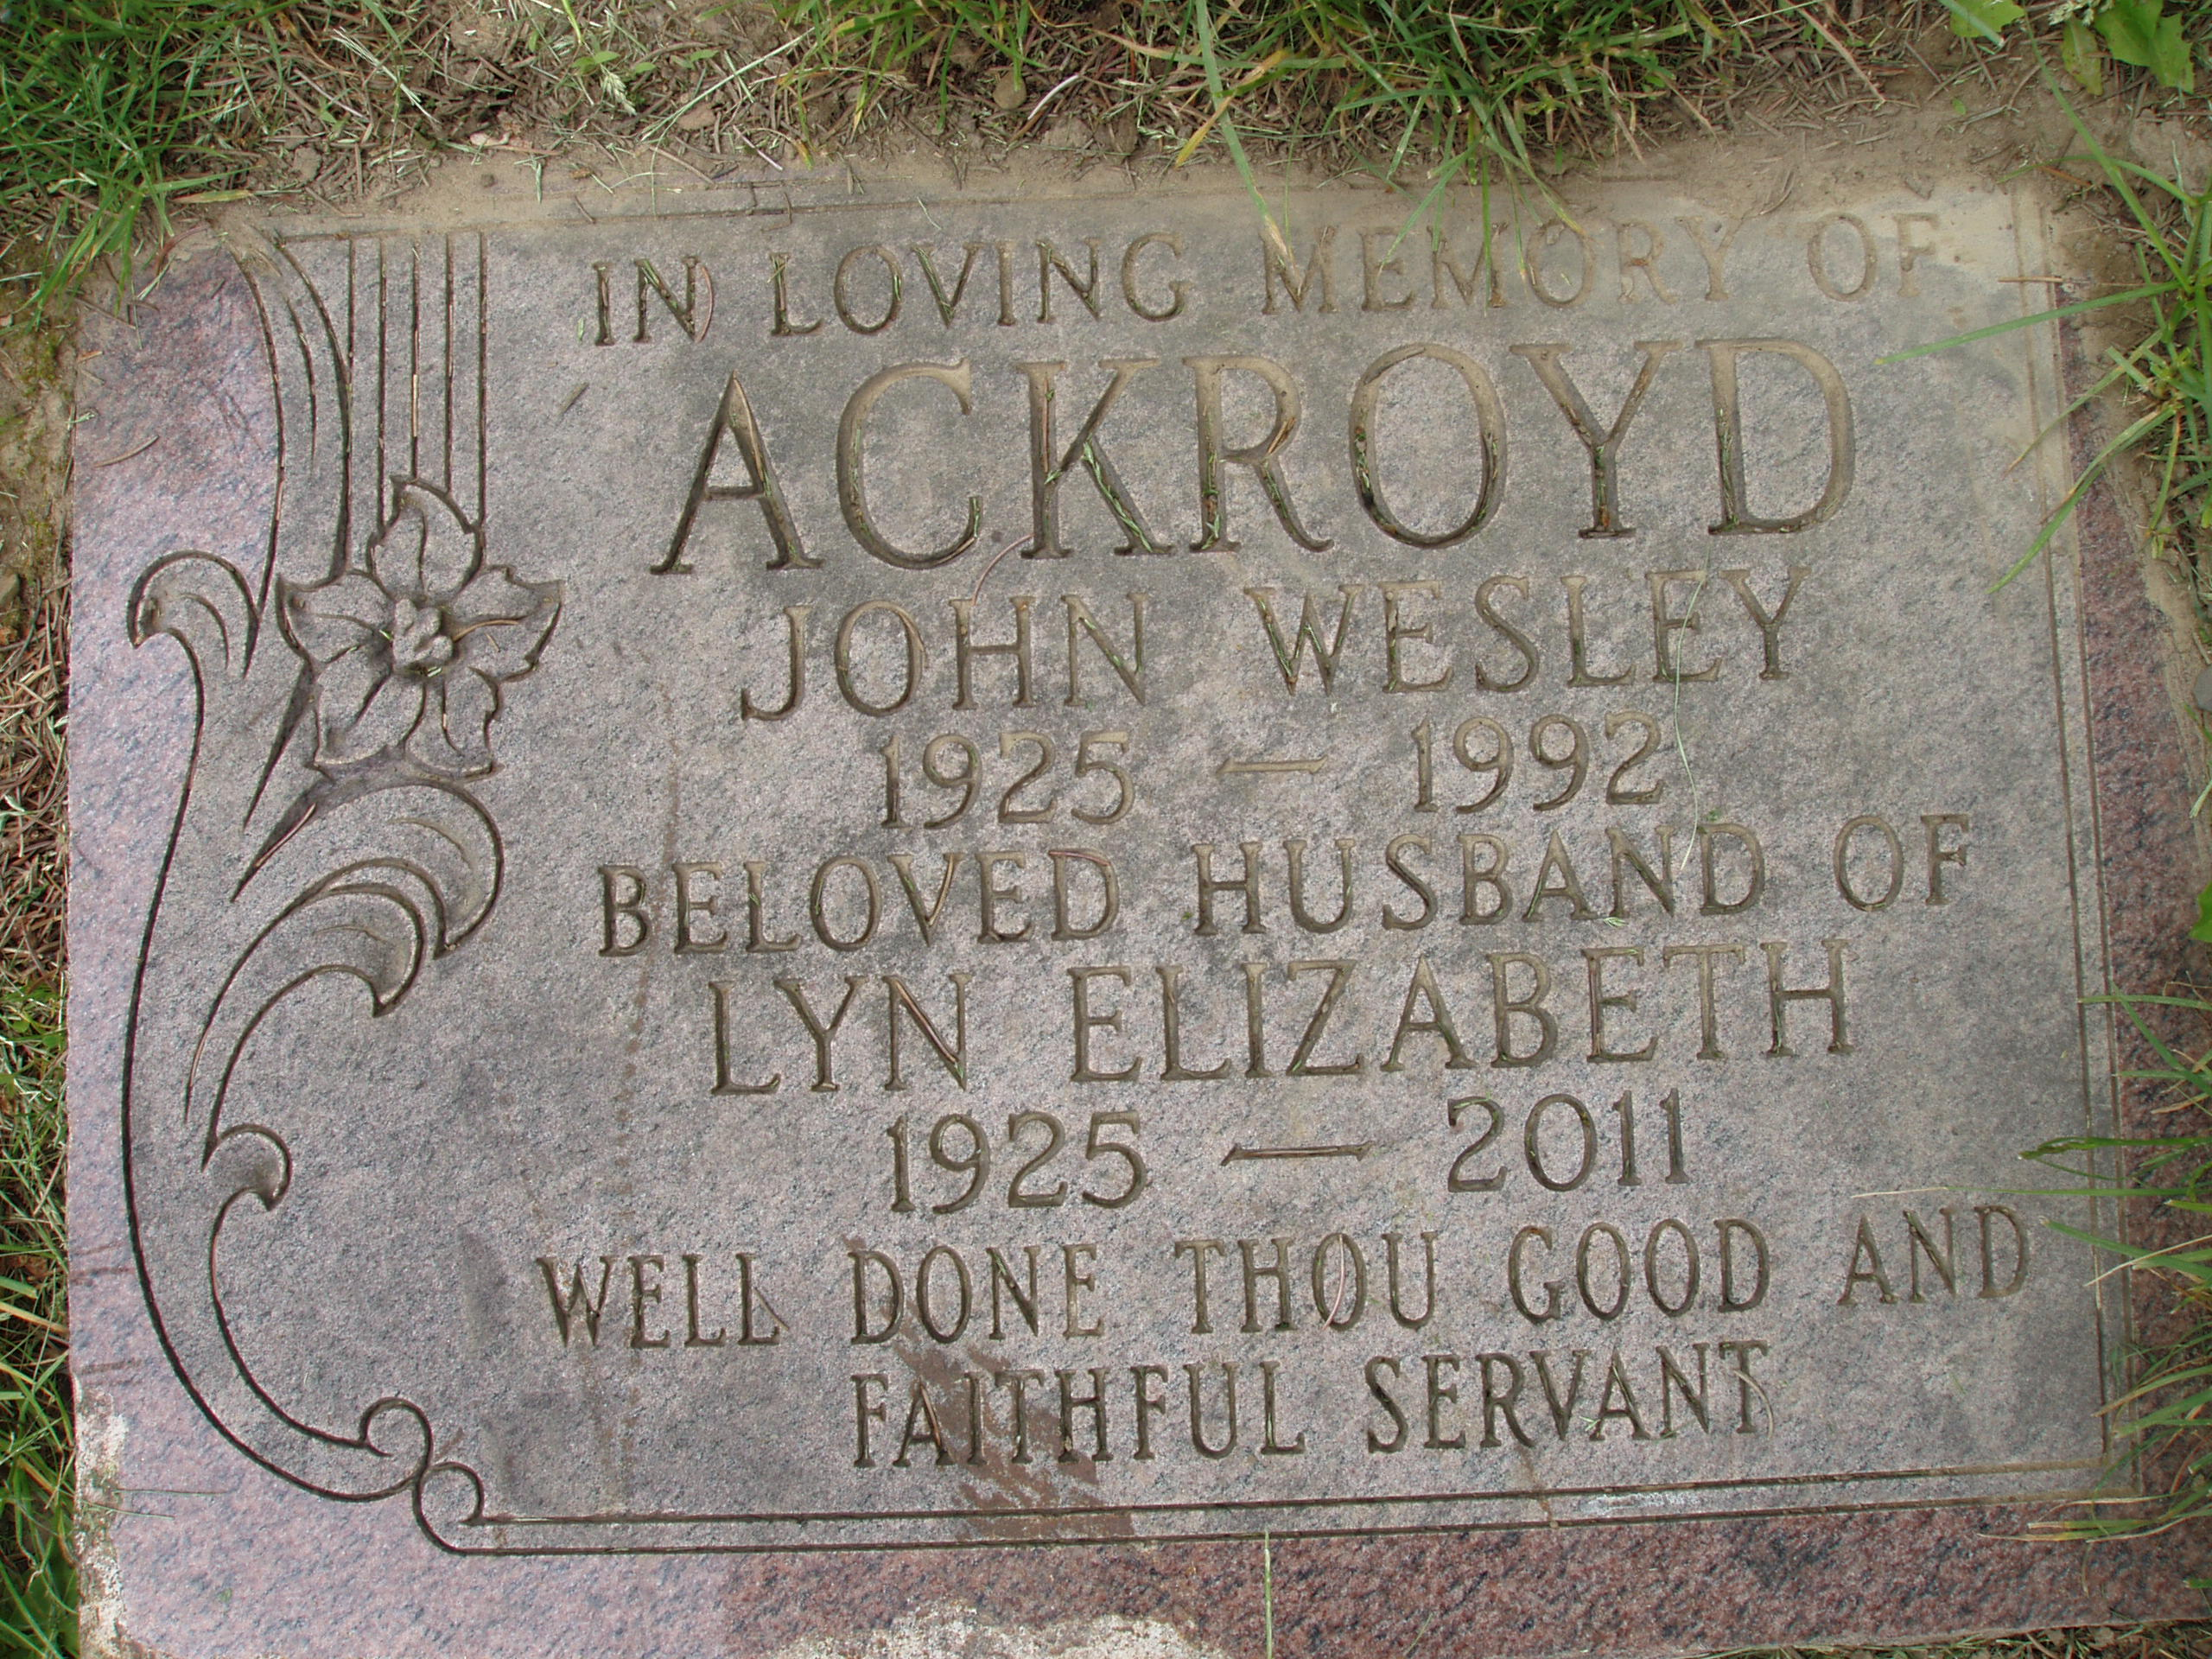 Jack Wesley Kojack Ackroyd